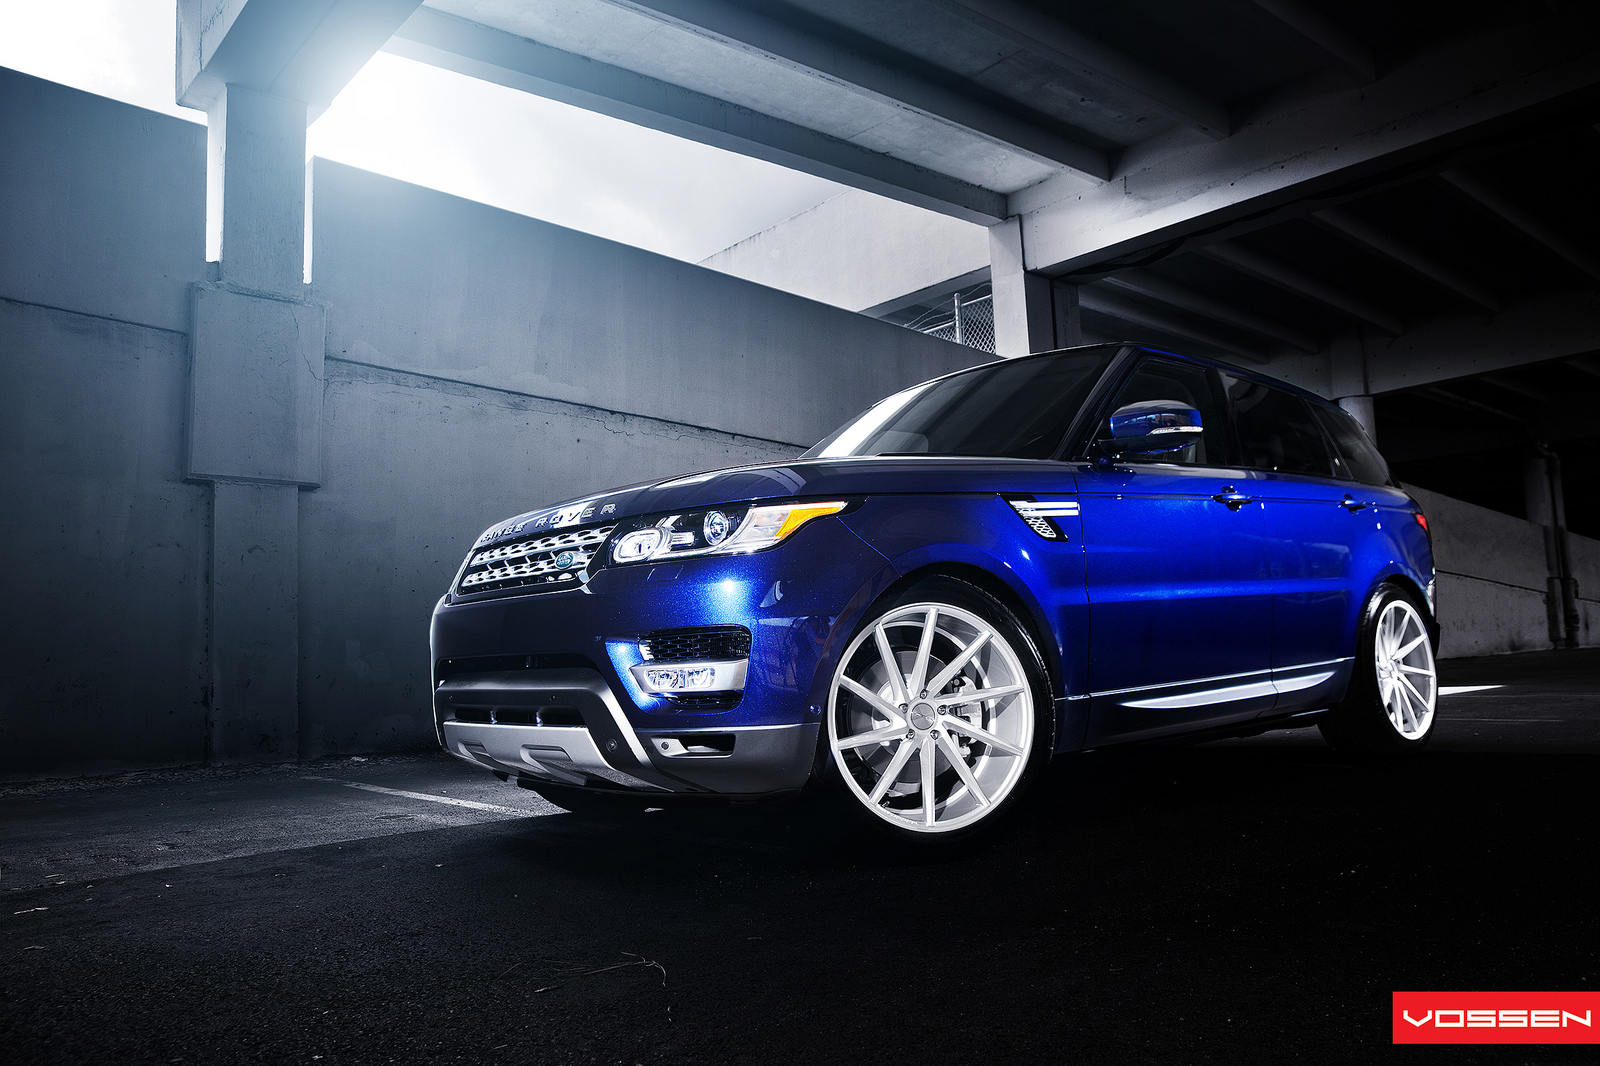 2014 Range Rover Wheels 2014 Range Rover Sport Gets